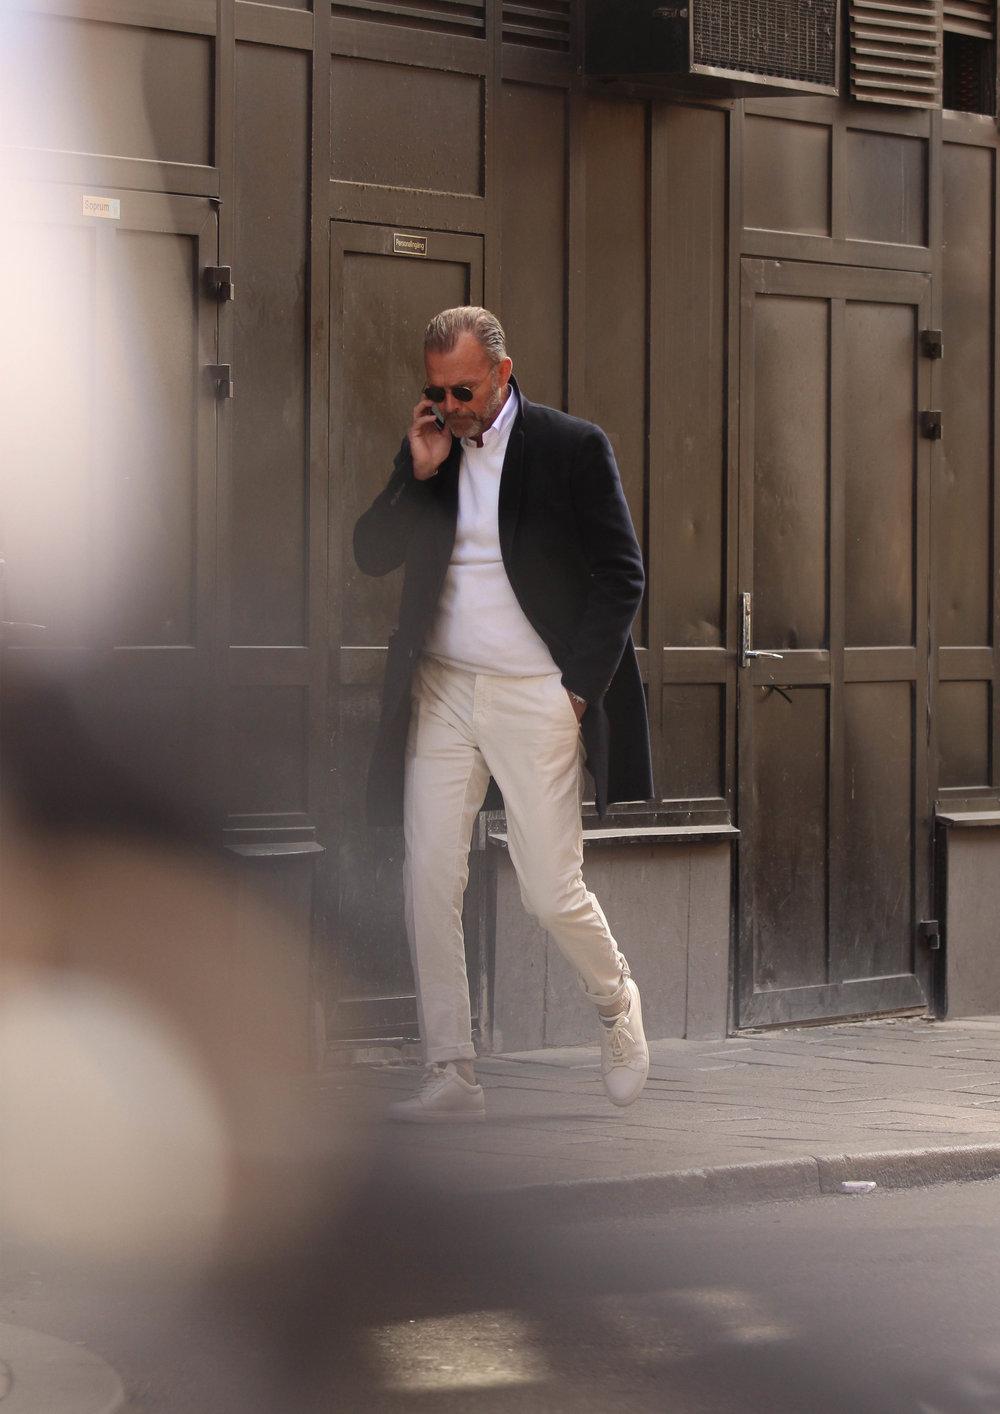 Manteau Loro Piana - Polo Sunspel - Pantalon Incotex - Lunettes The Bespoke Dudes